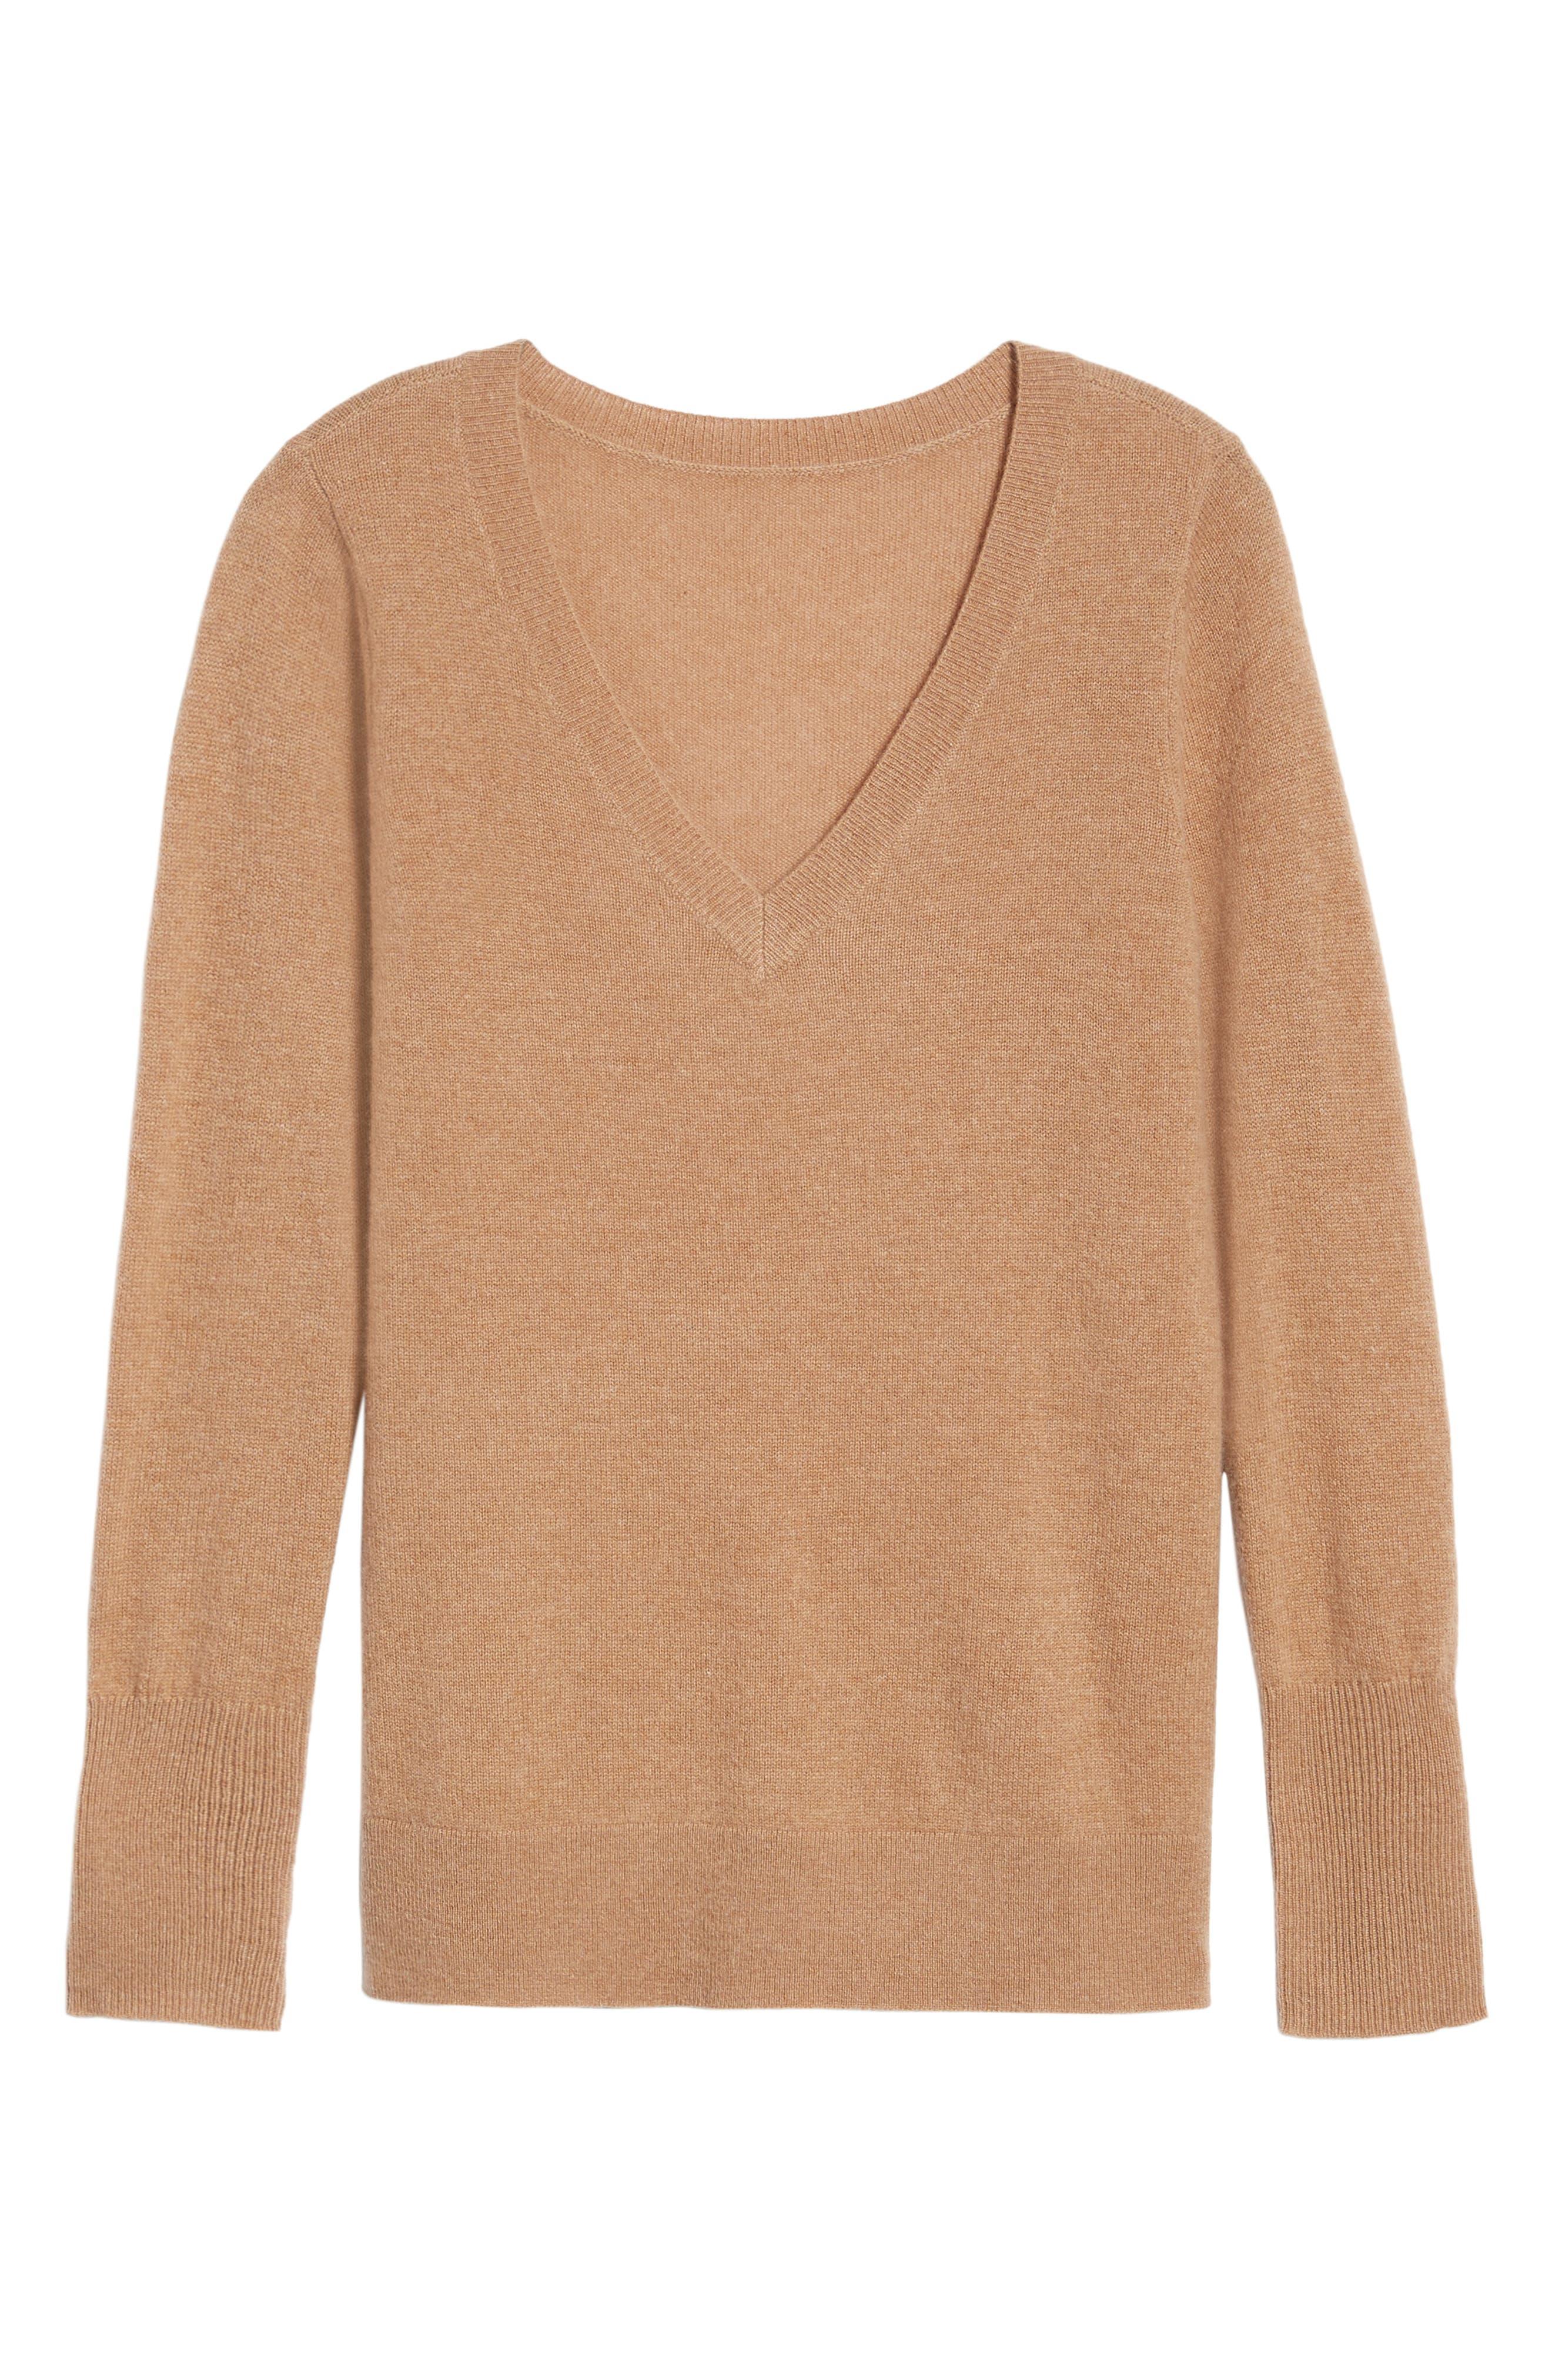 ,                             V-Neck Cashmere Sweater,                             Alternate thumbnail 29, color,                             235